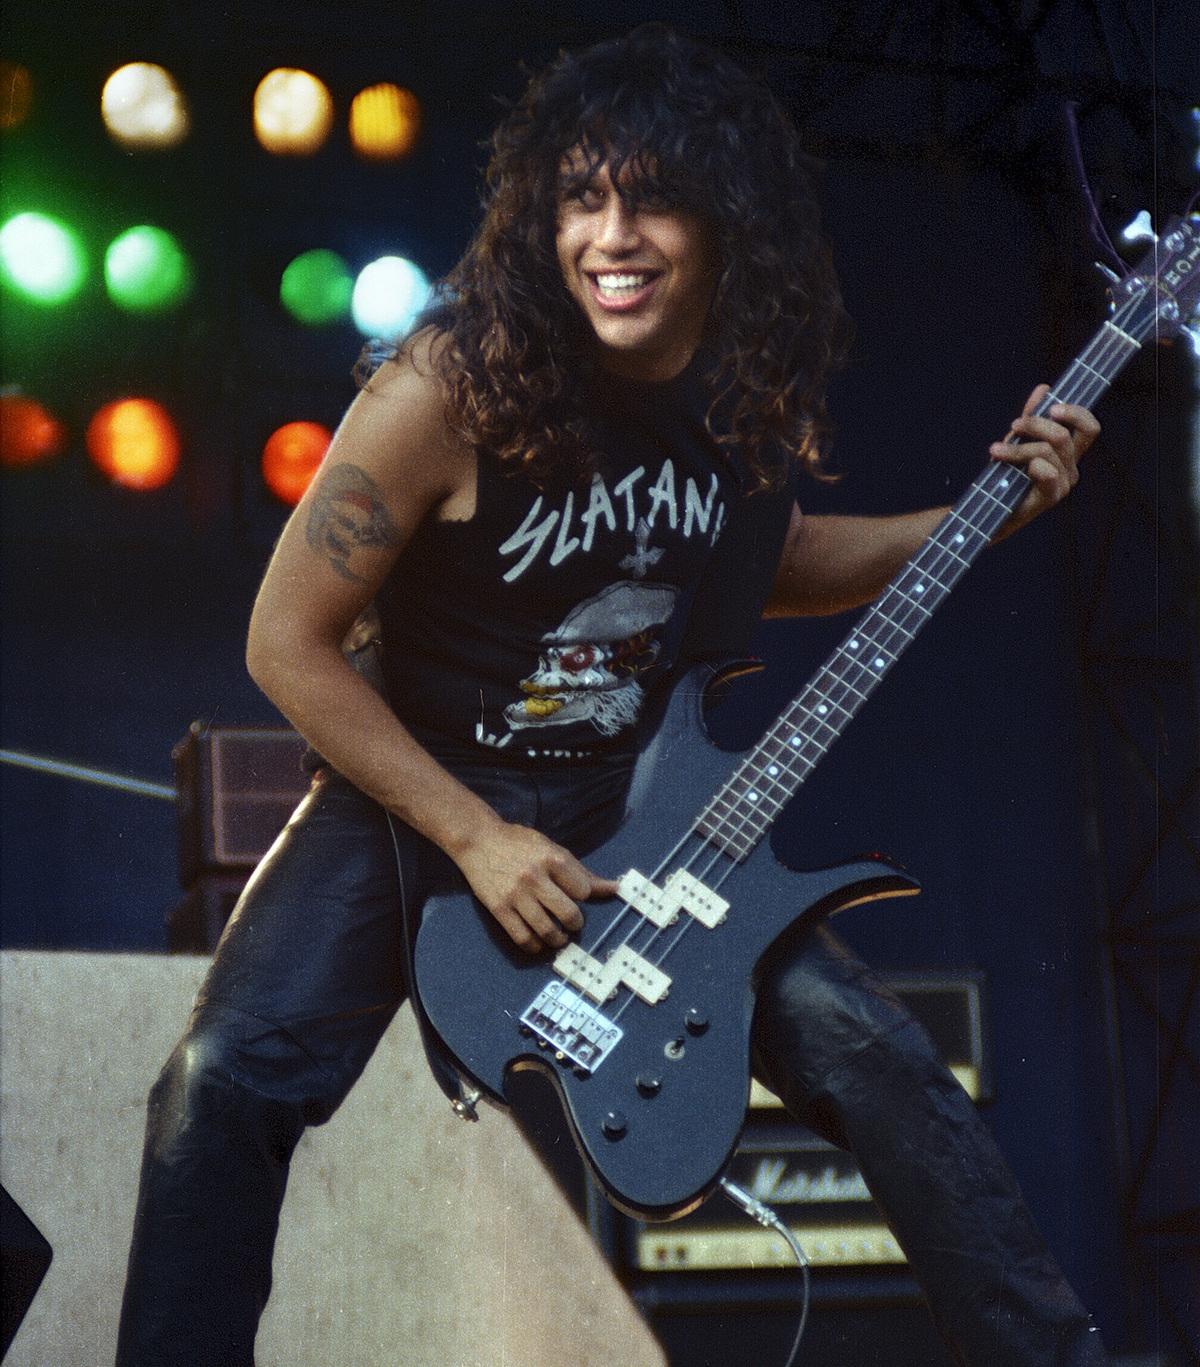 Exclusive Rock Photography (1980's - 1990's) of METALLICA